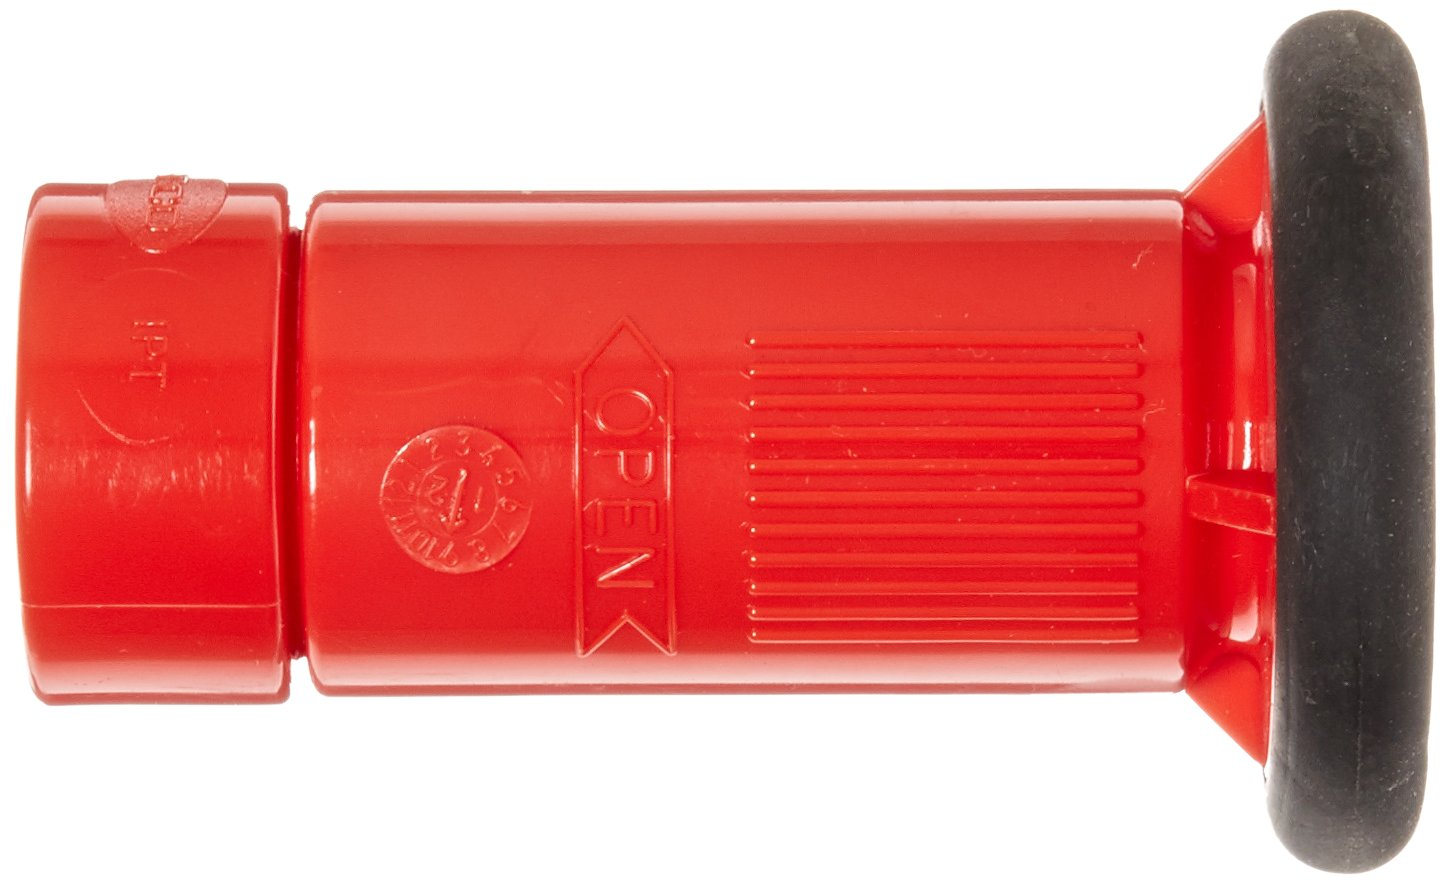 1 NPS Dixon Valve HGB100S Polycarbonate Fire Equipment Thermoplastic Fog Nozzle with Bumper